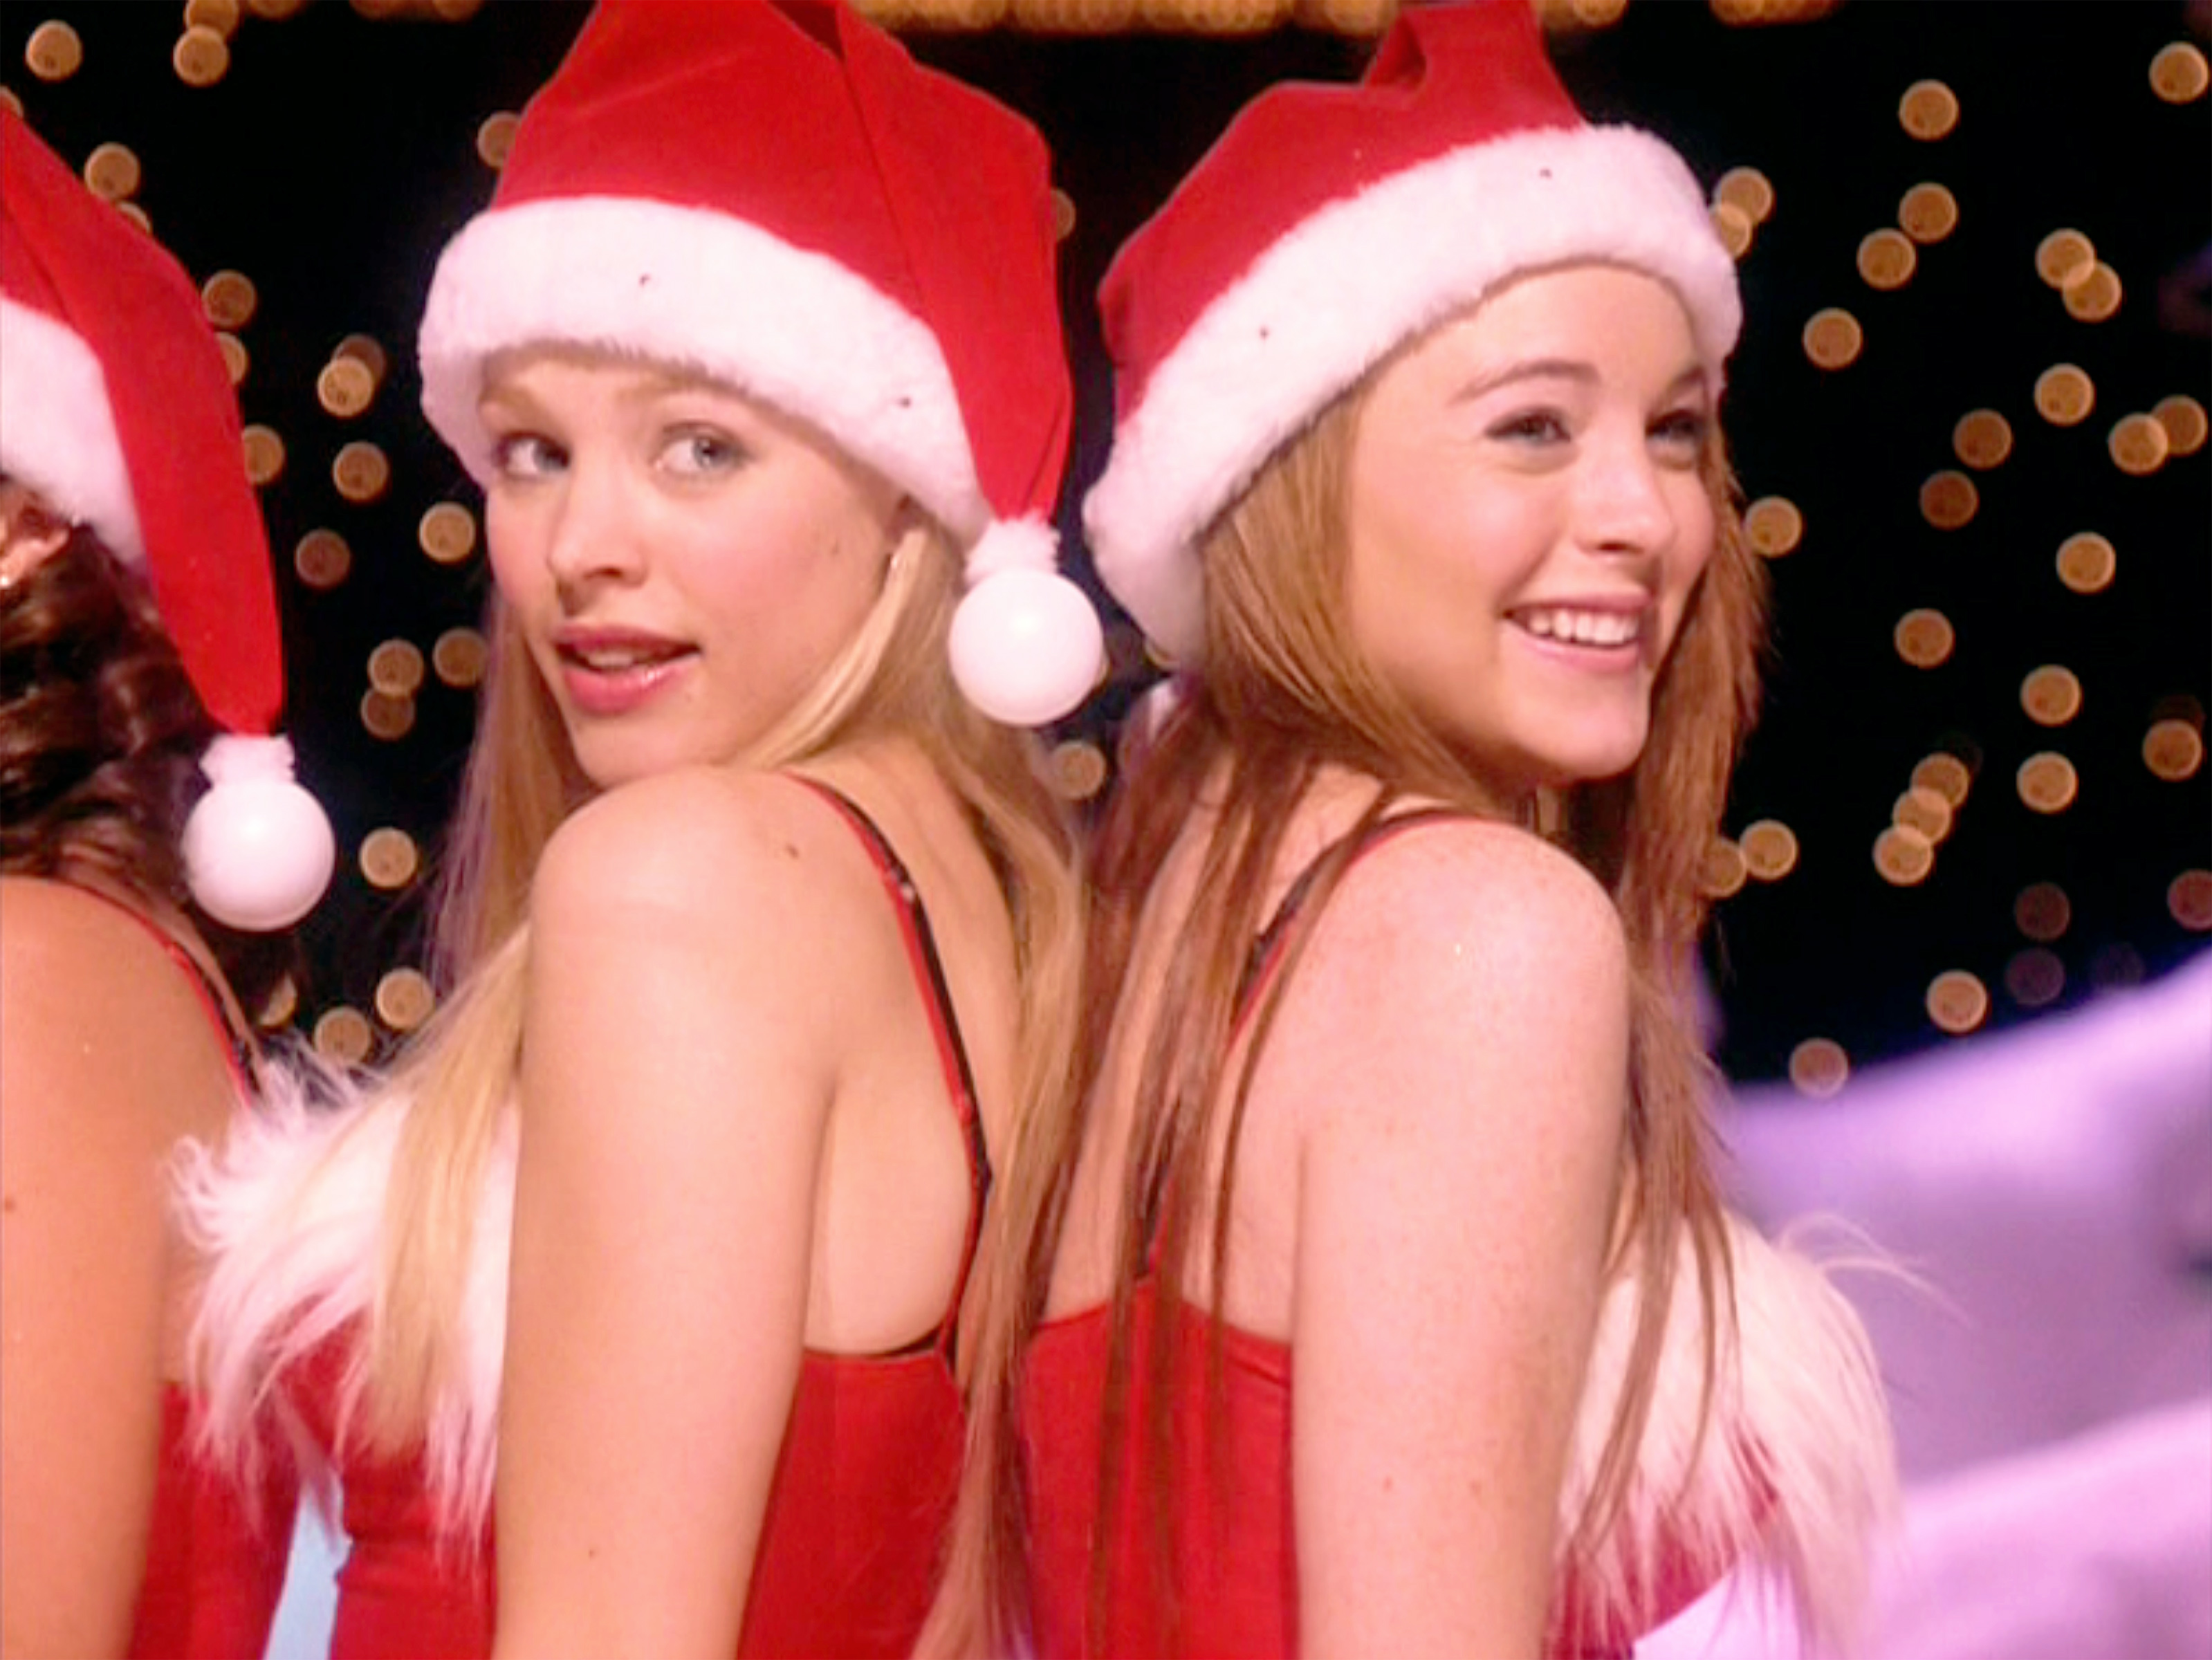 Lindsay Lohan and Rachel McAdams in Mean Girls (2004)